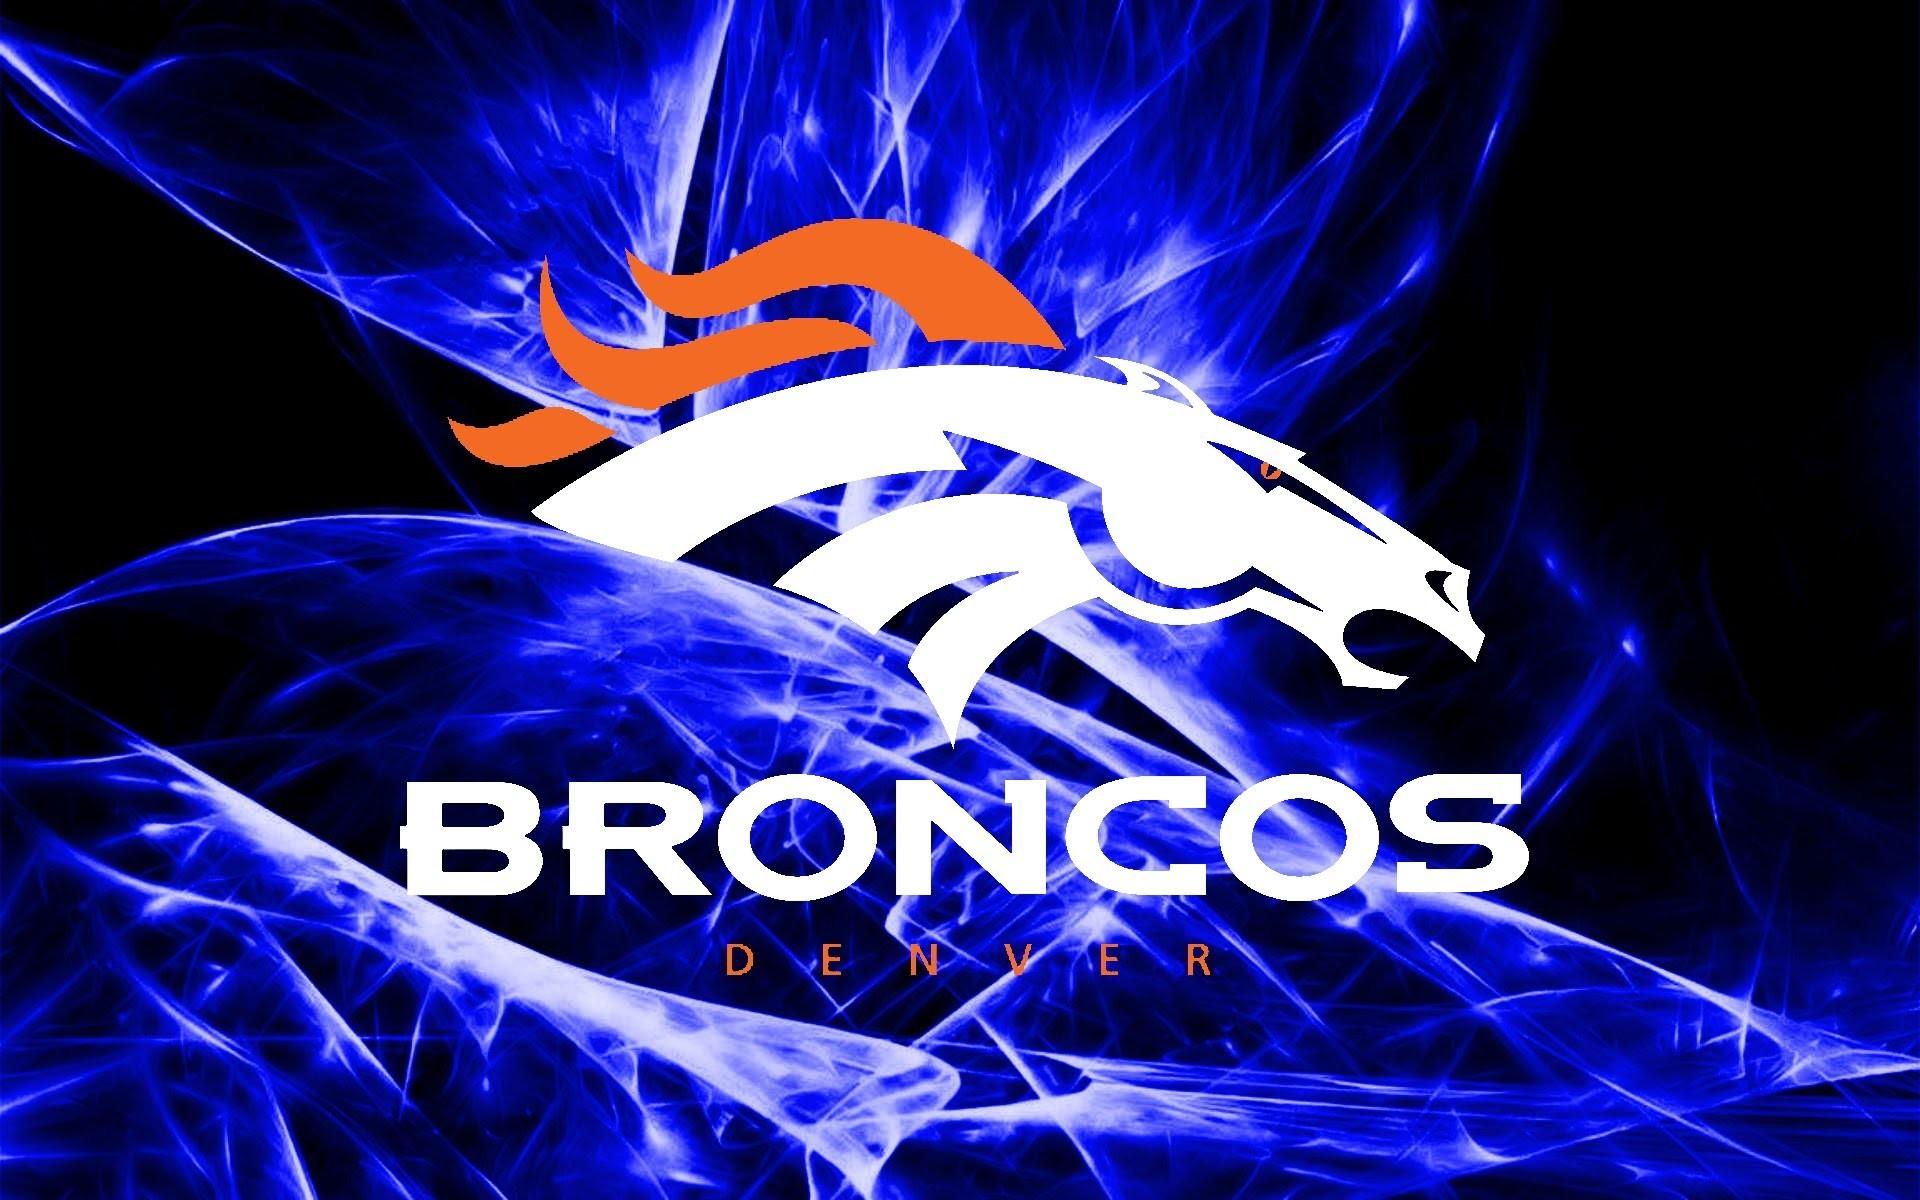 Broncos Wallpaper